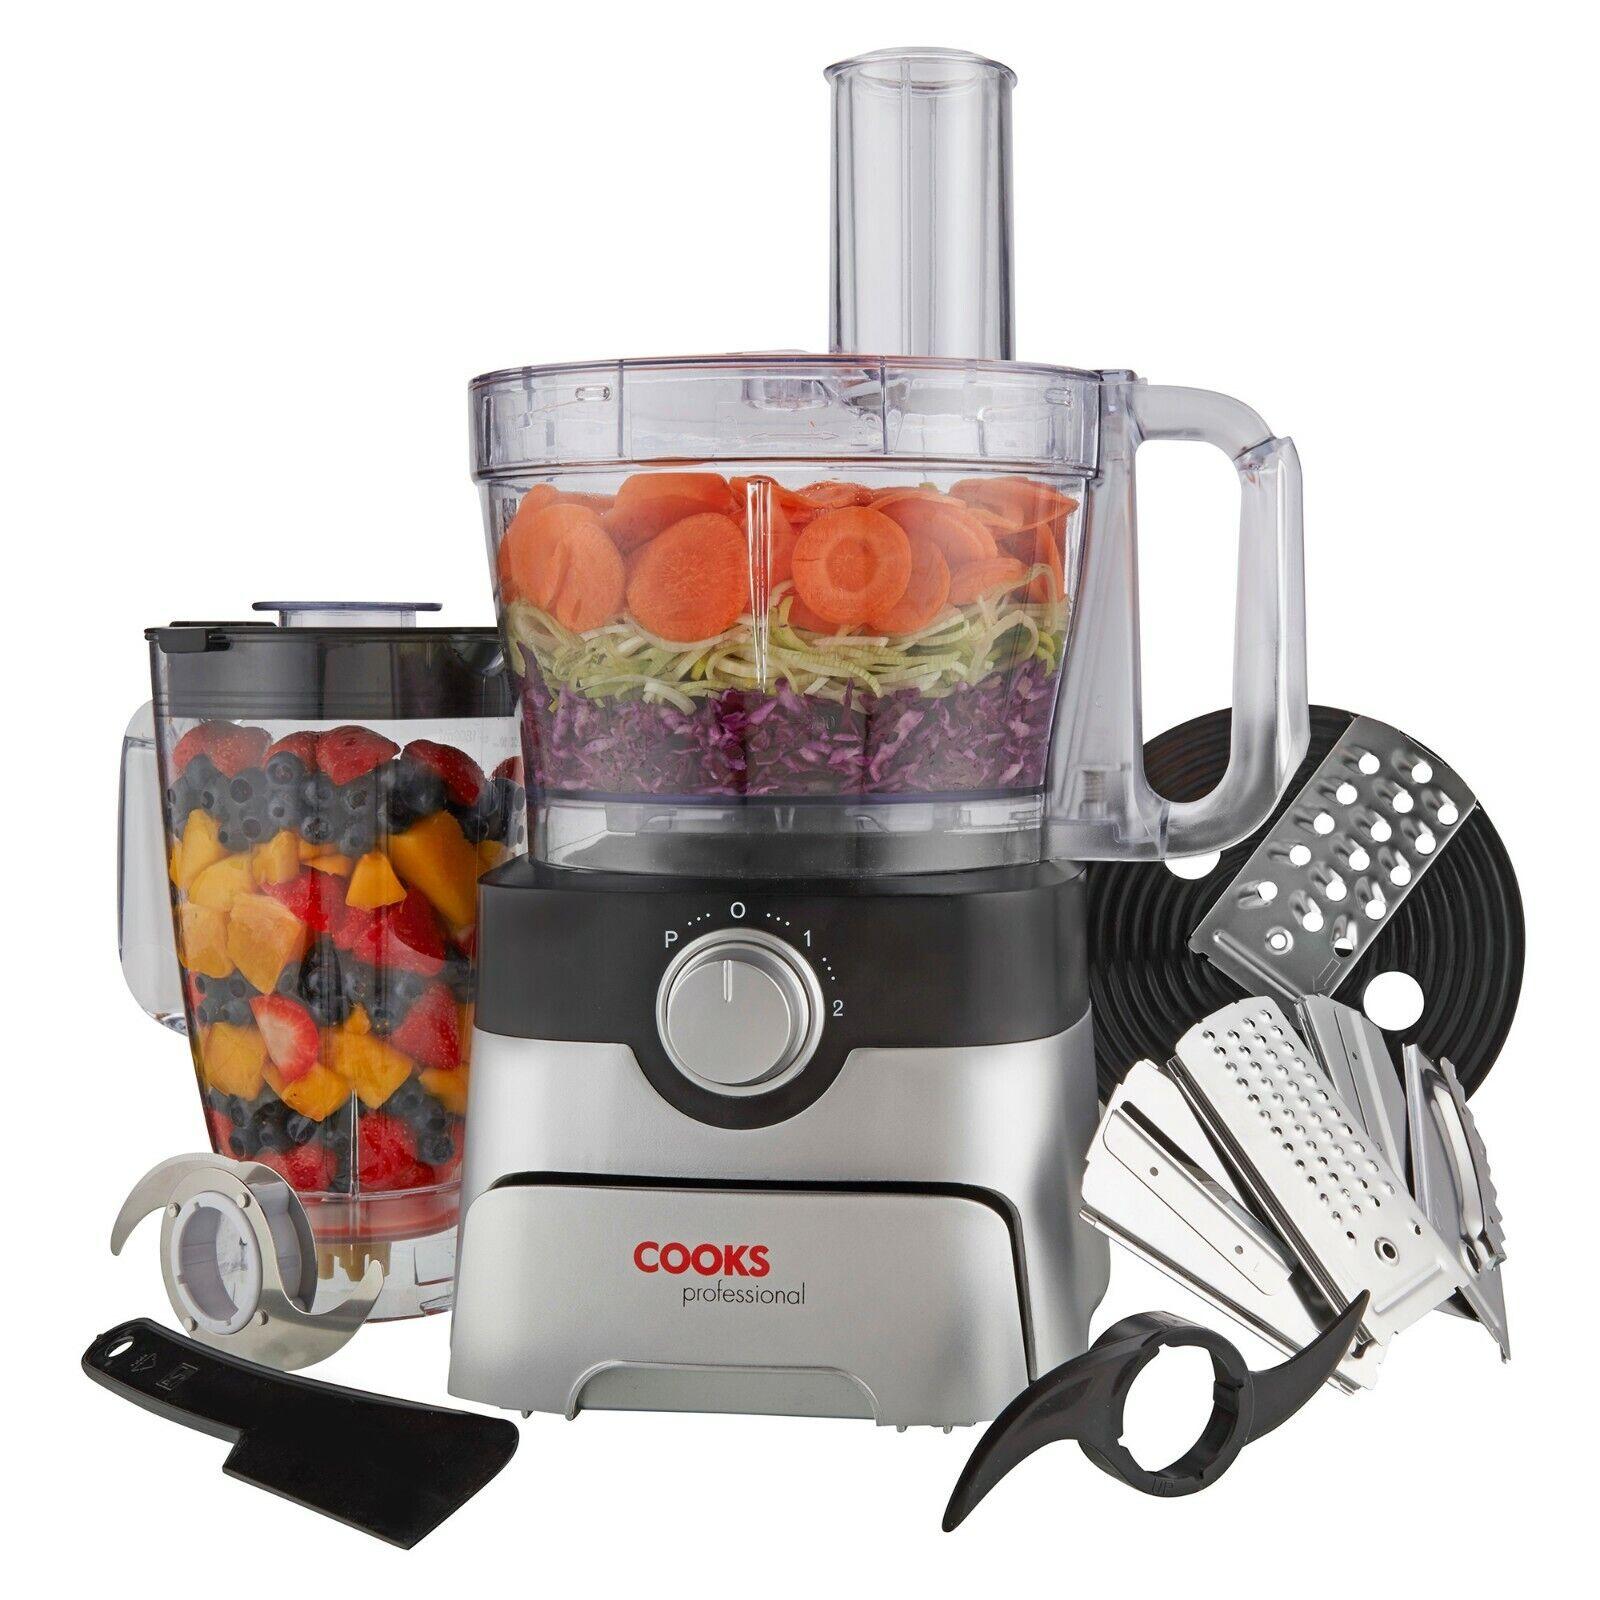 Cooks Professional 1000W Food Processor Kitchen Blender ...